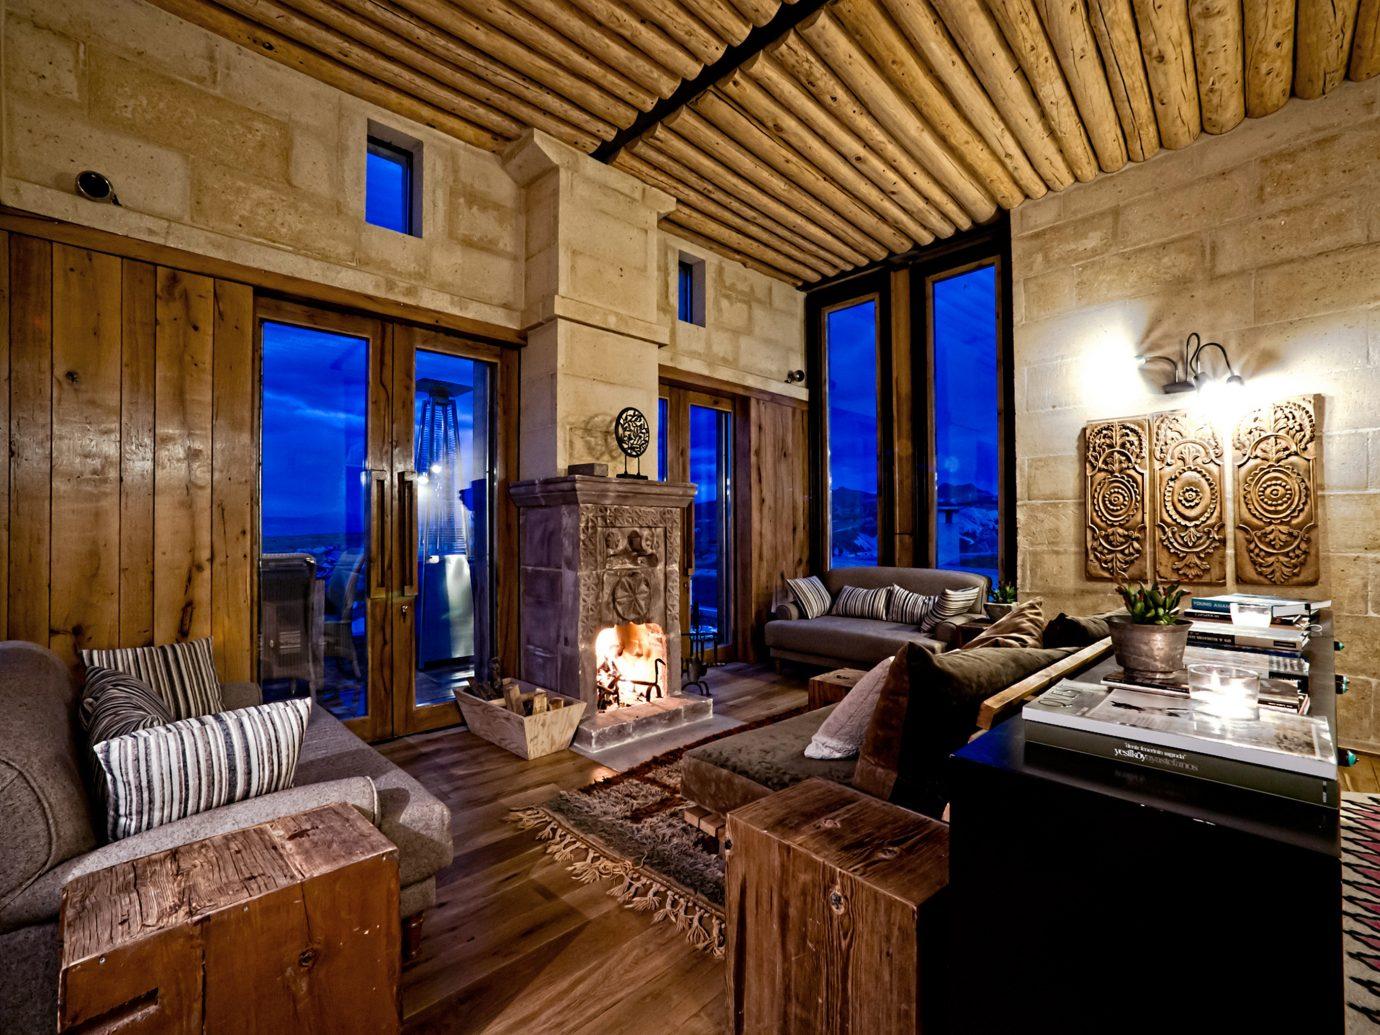 Suite at Argos in Cappadocia